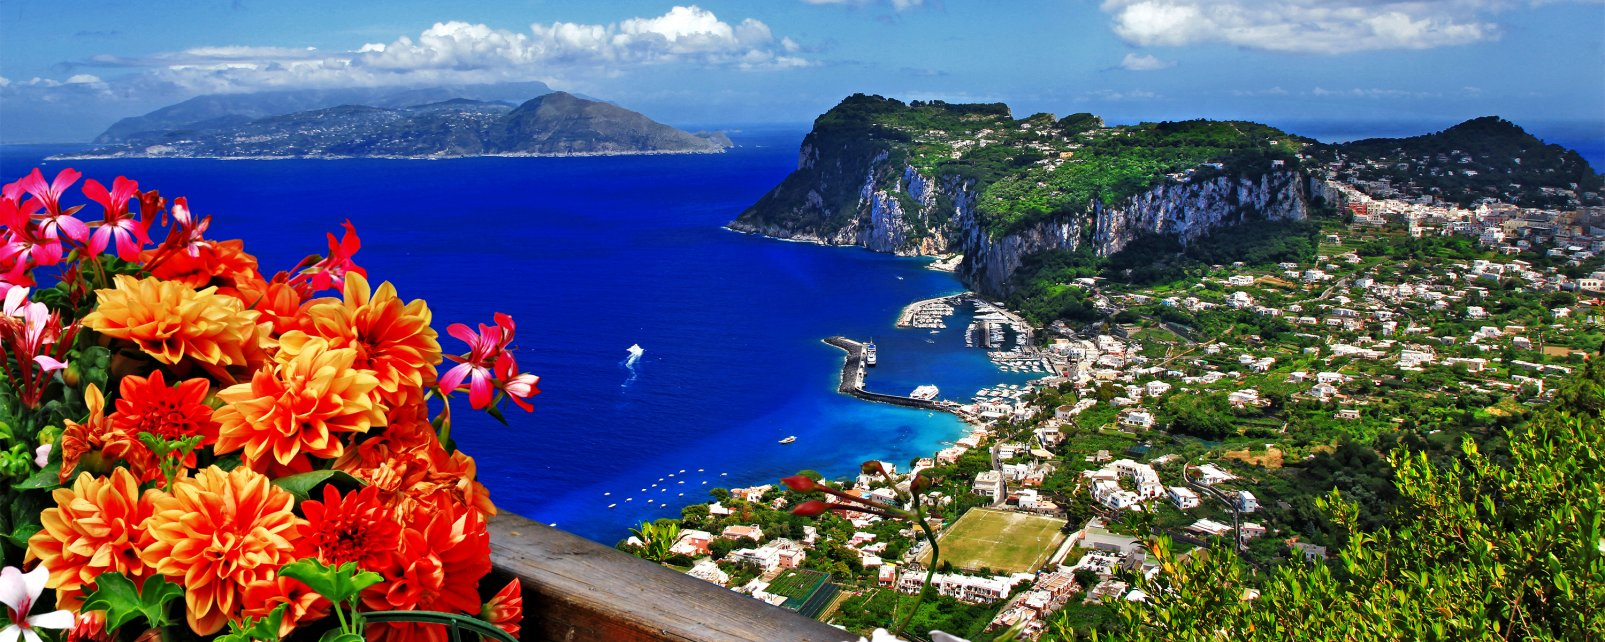 Capri, Campania, Italia,